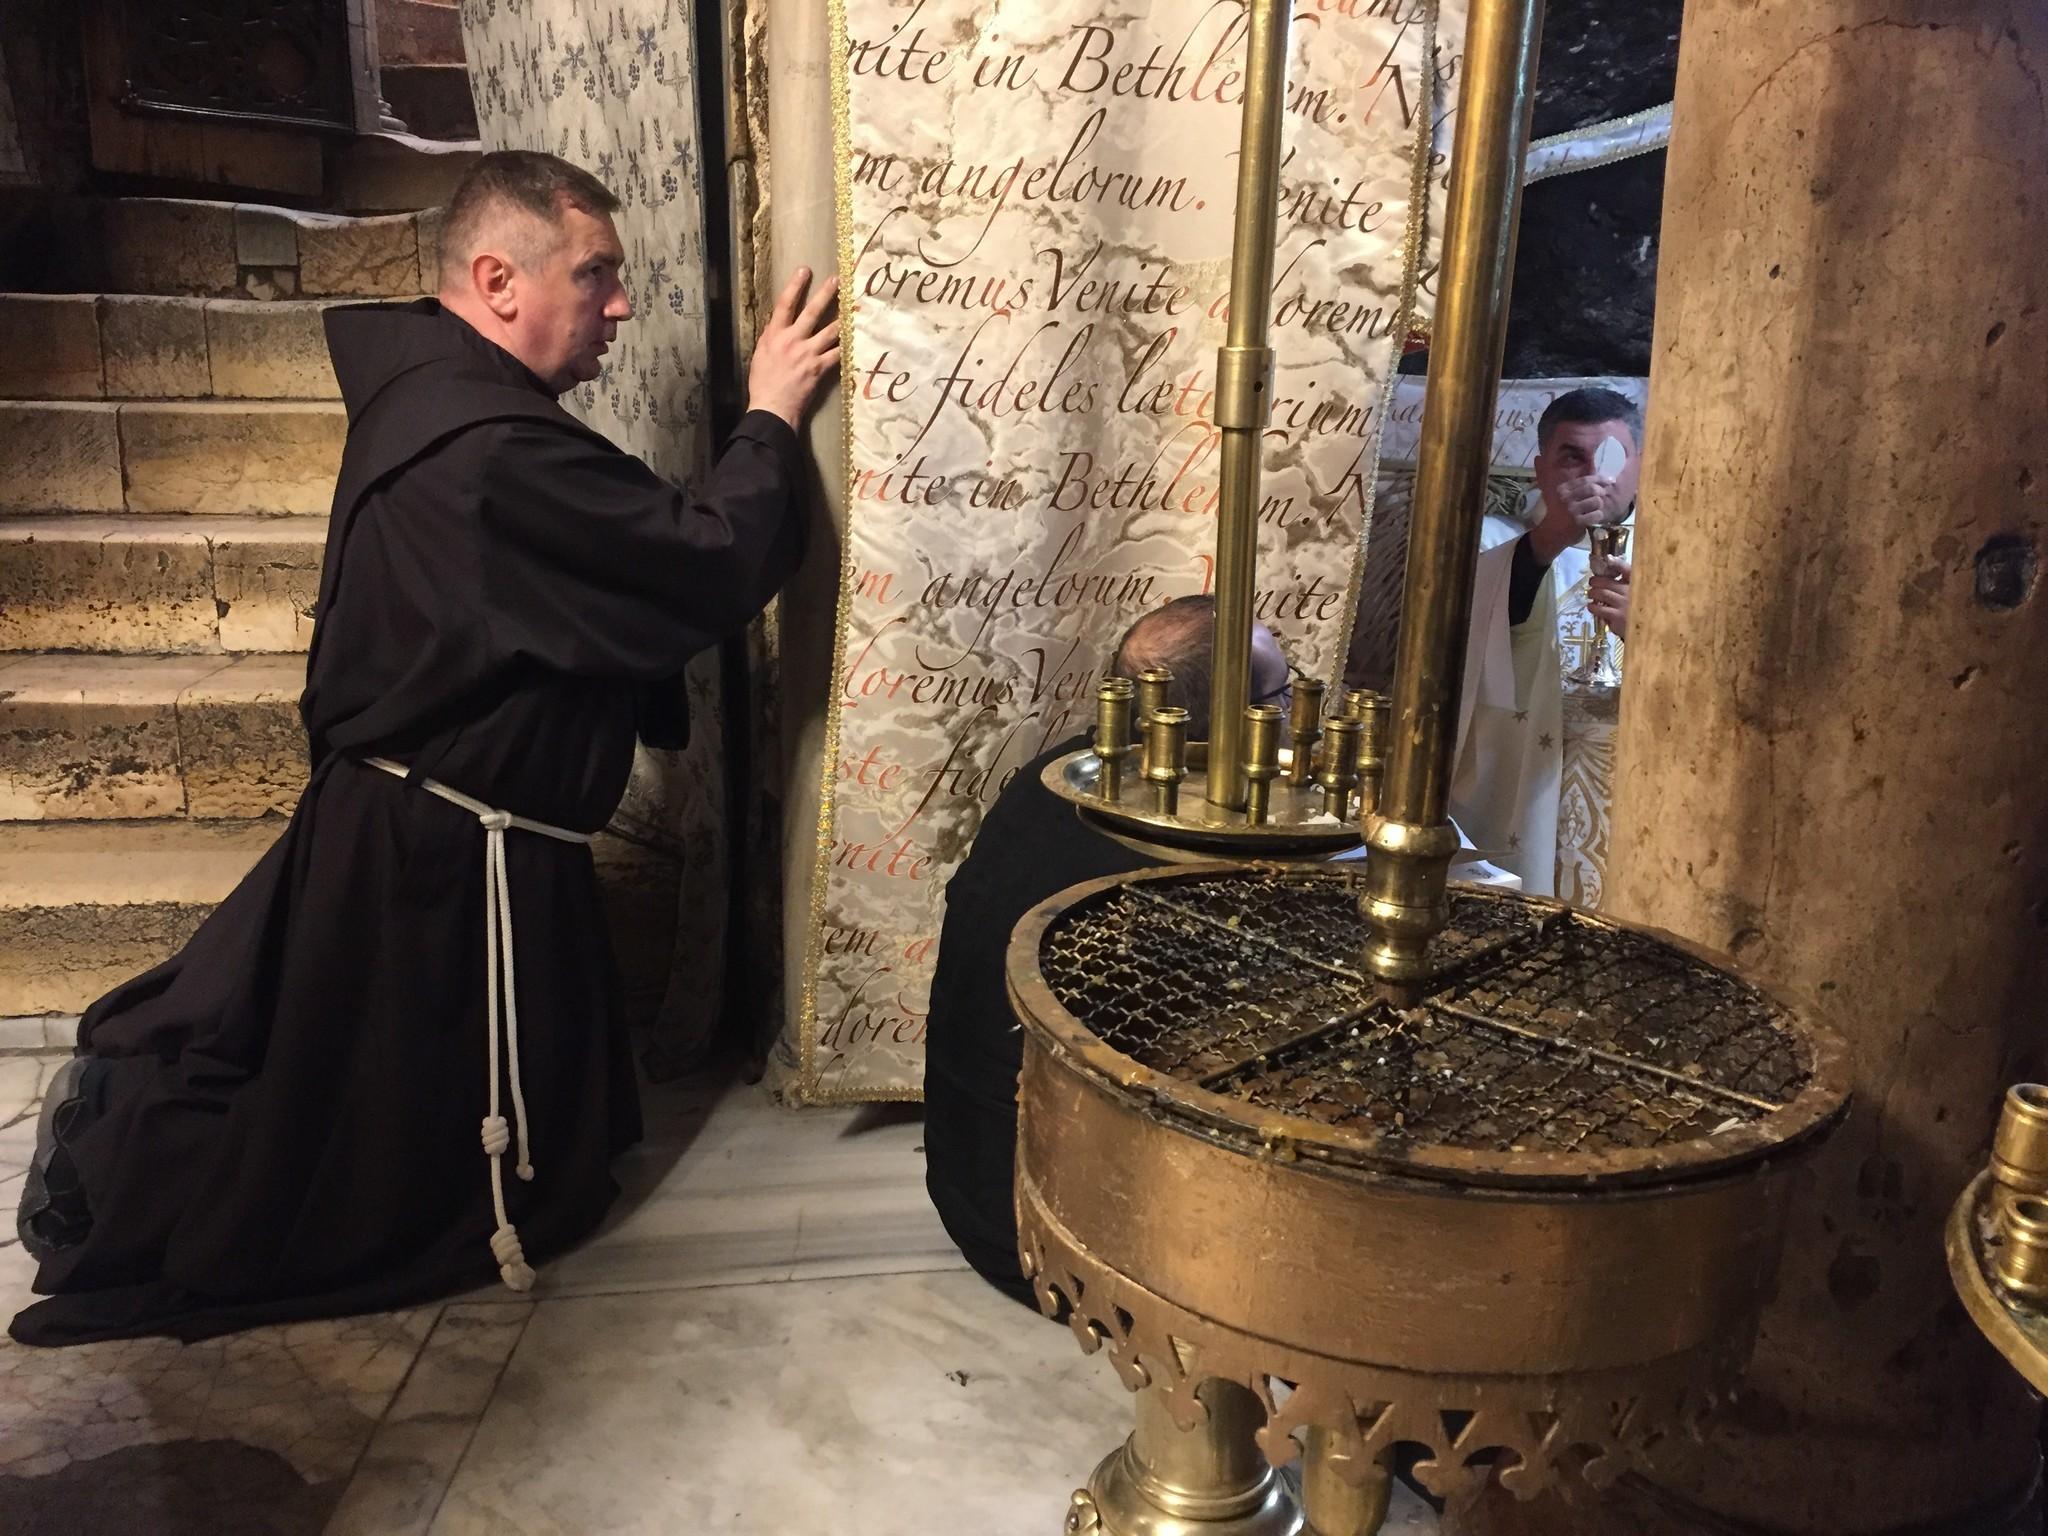 Father Hanna Mass'ad